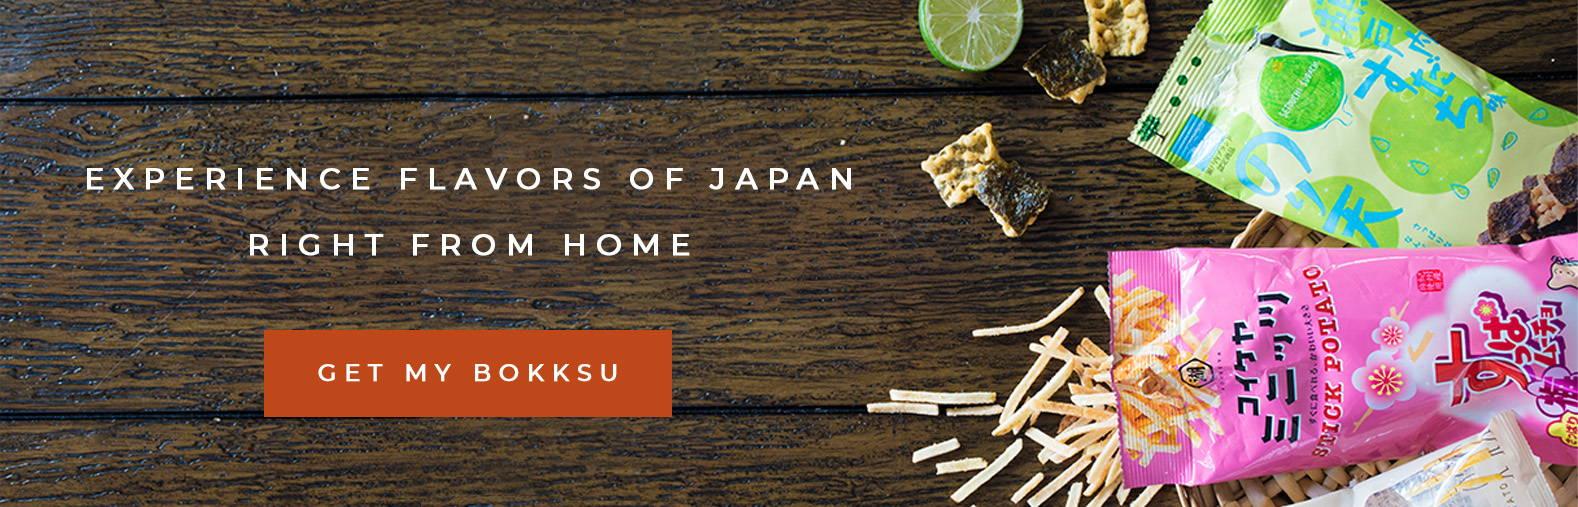 join Bokksu Japanese Snack Subscription box service